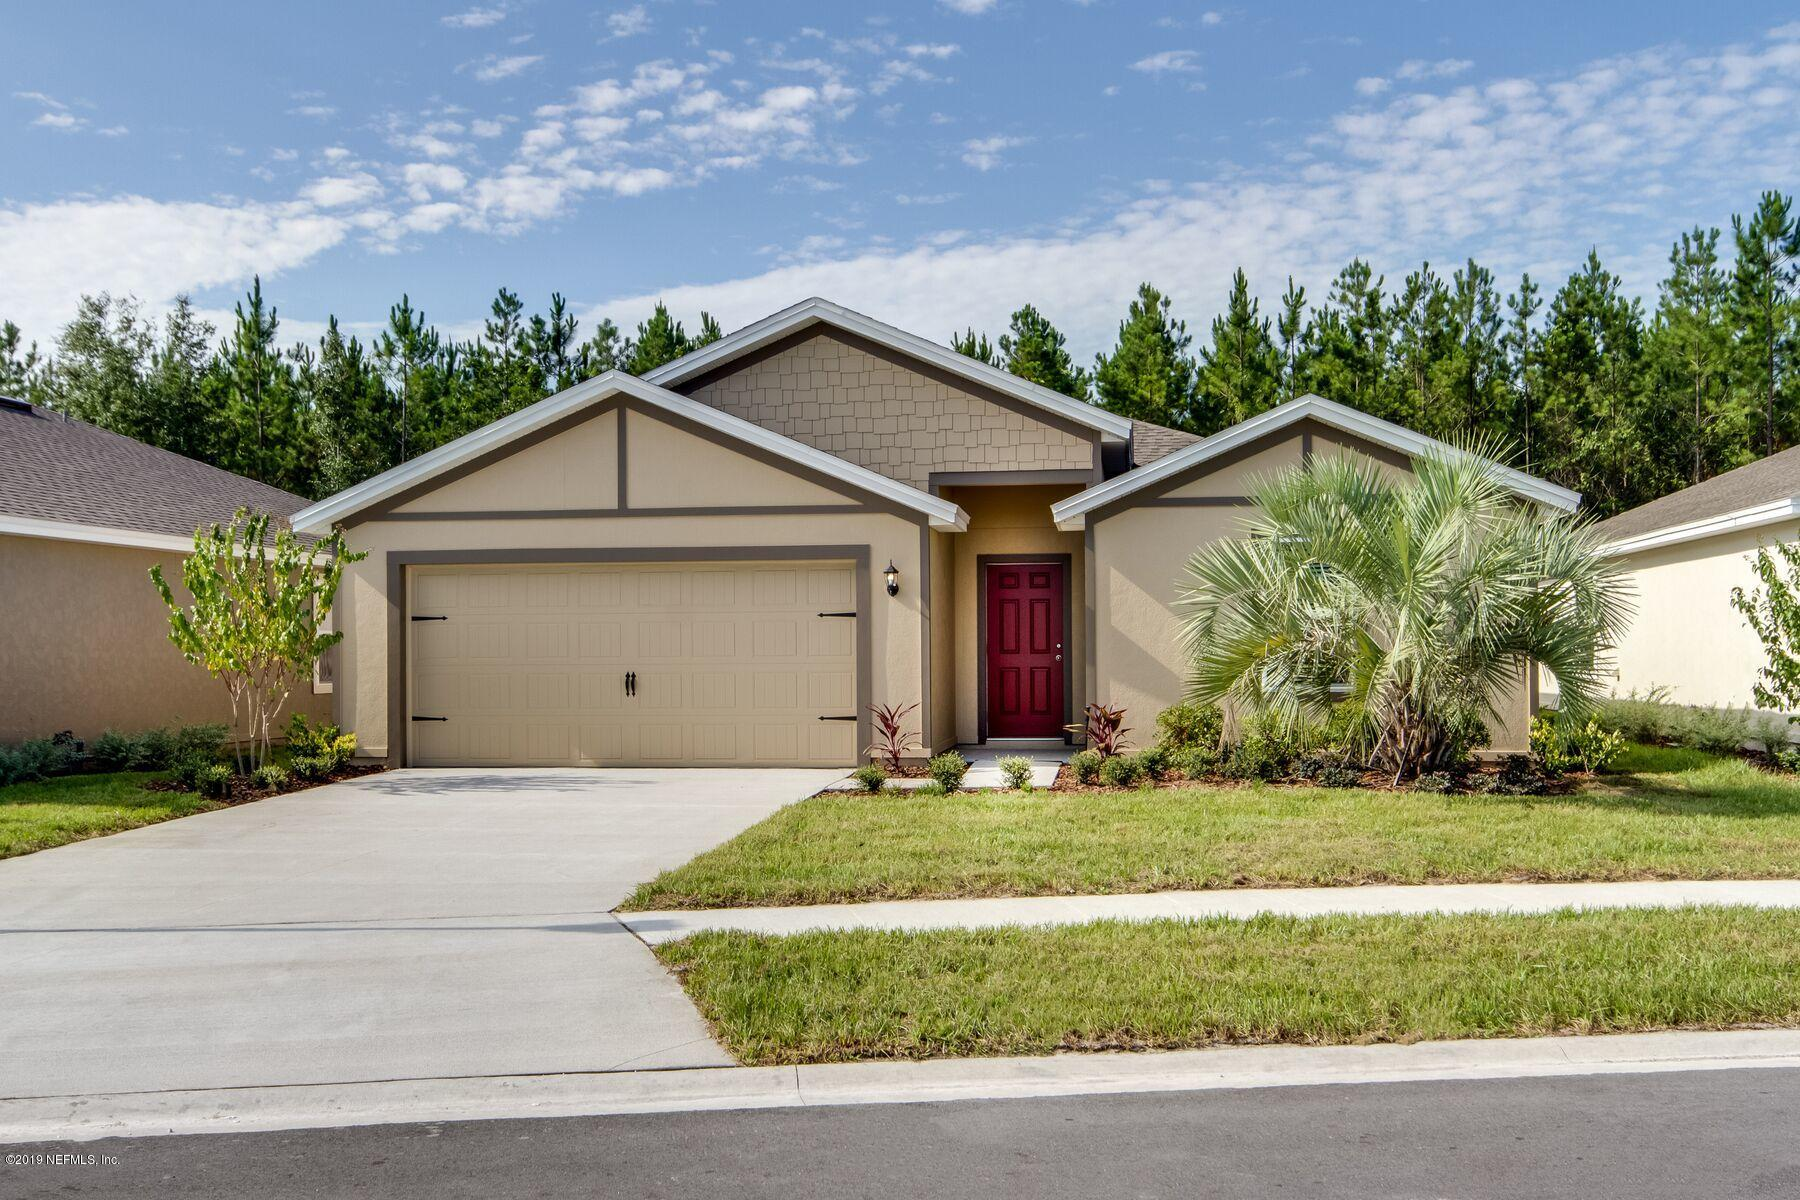 8673 LAKE GEORGE, MACCLENNY, FLORIDA 32063, 5 Bedrooms Bedrooms, ,3 BathroomsBathrooms,Residential,For sale,LAKE GEORGE,1058123